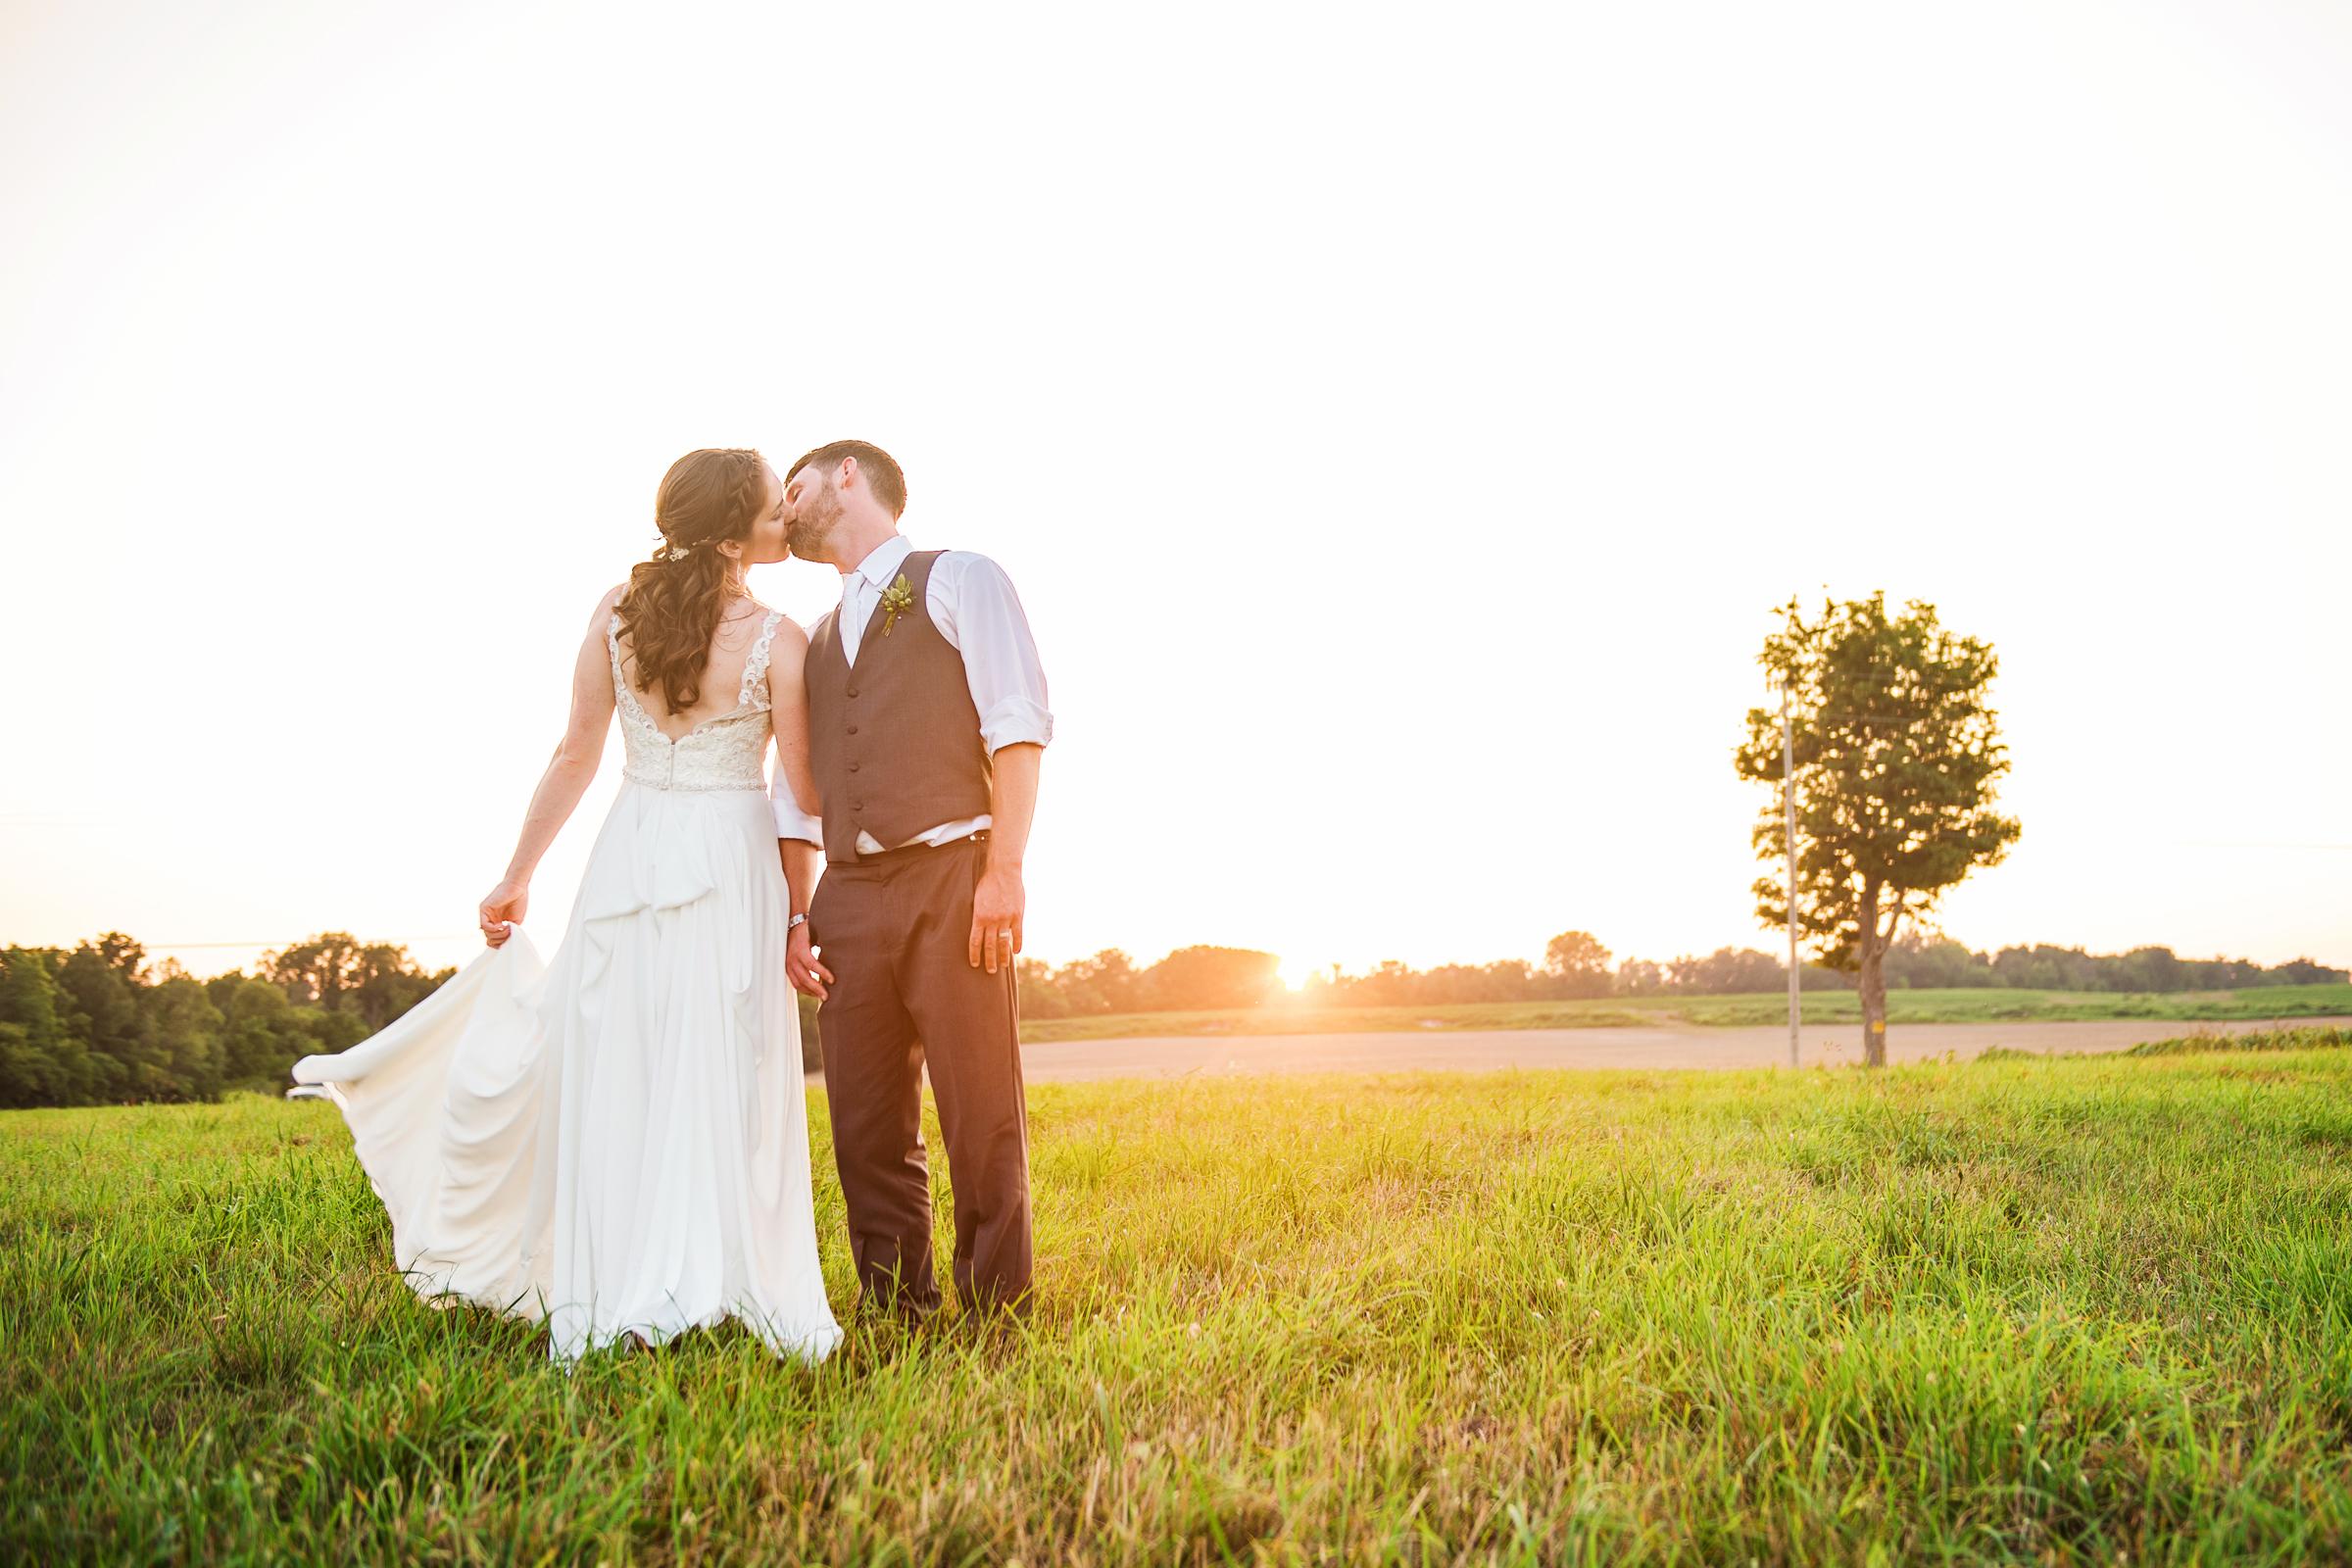 Jerris_Wadsworth_Wedding_Barn_Rochester_Wedding_JILL_STUDIO_Rochester_NY_Photographer_DSC_3099.jpg